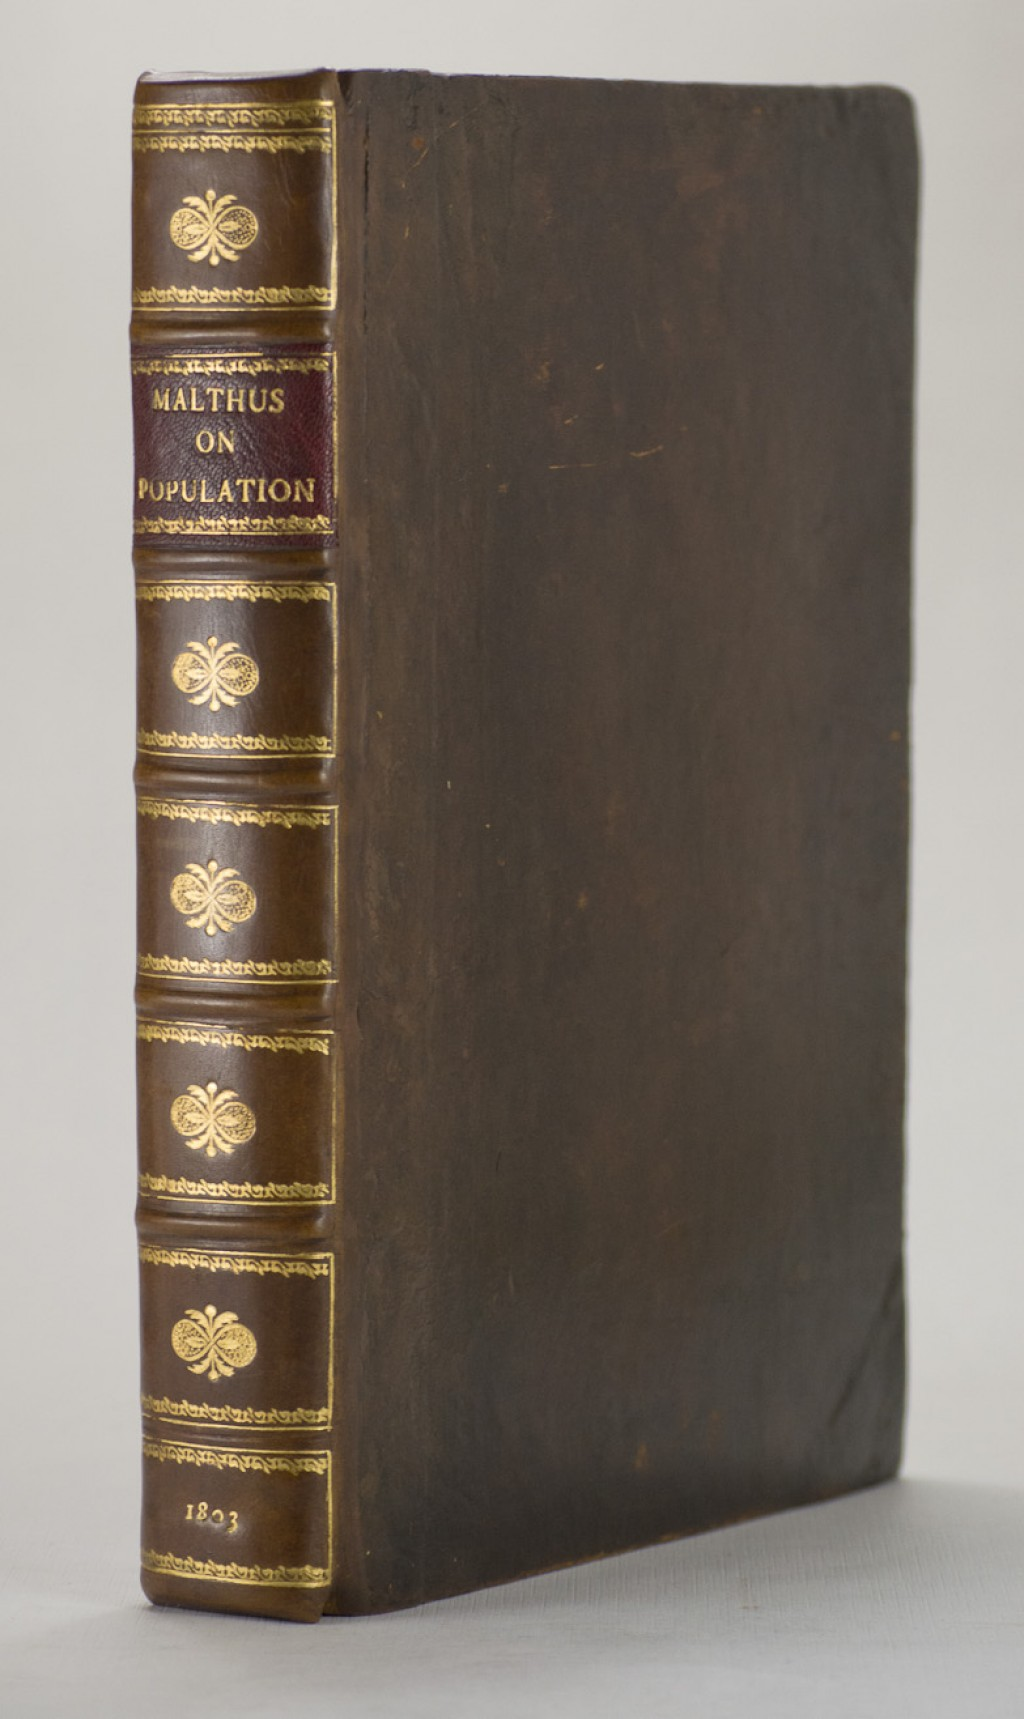 014 Thomas Malthus Essay On The Principle Of Population 65276 1 Stupendous After Reading Malthus's Principles Darwin Got Idea That Ap Euro Large